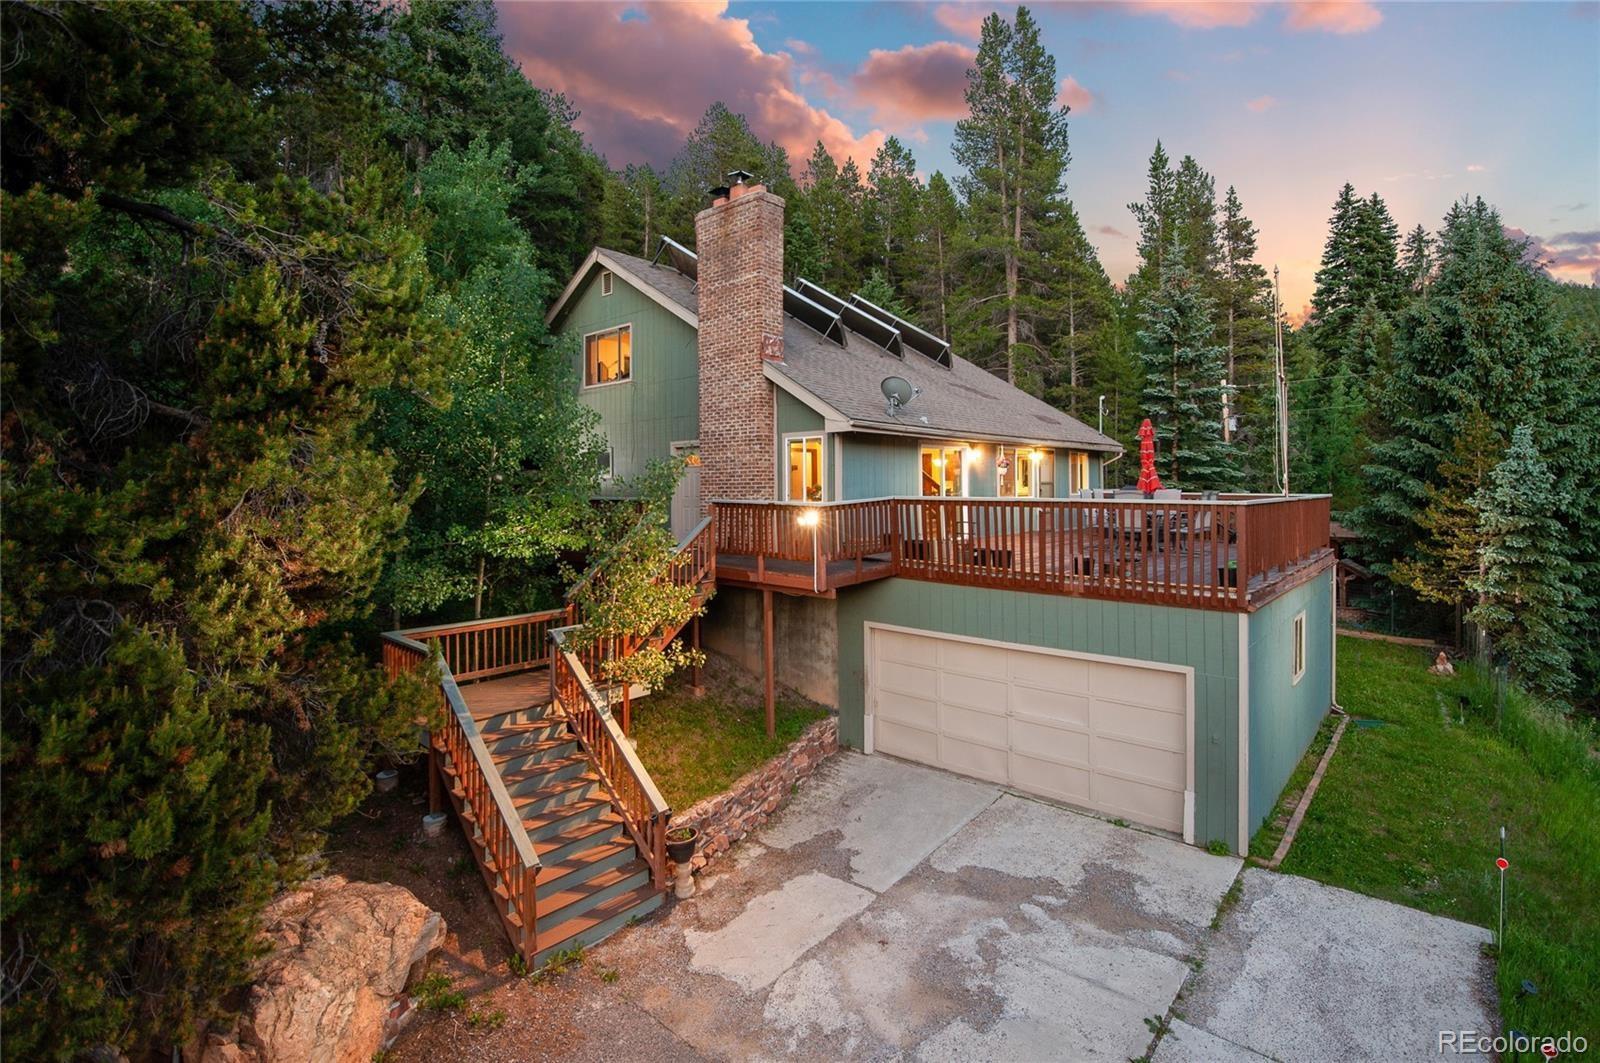 MLS# 5887293 - 1 - 8858 Black Mountain Drive, Conifer, CO 80433